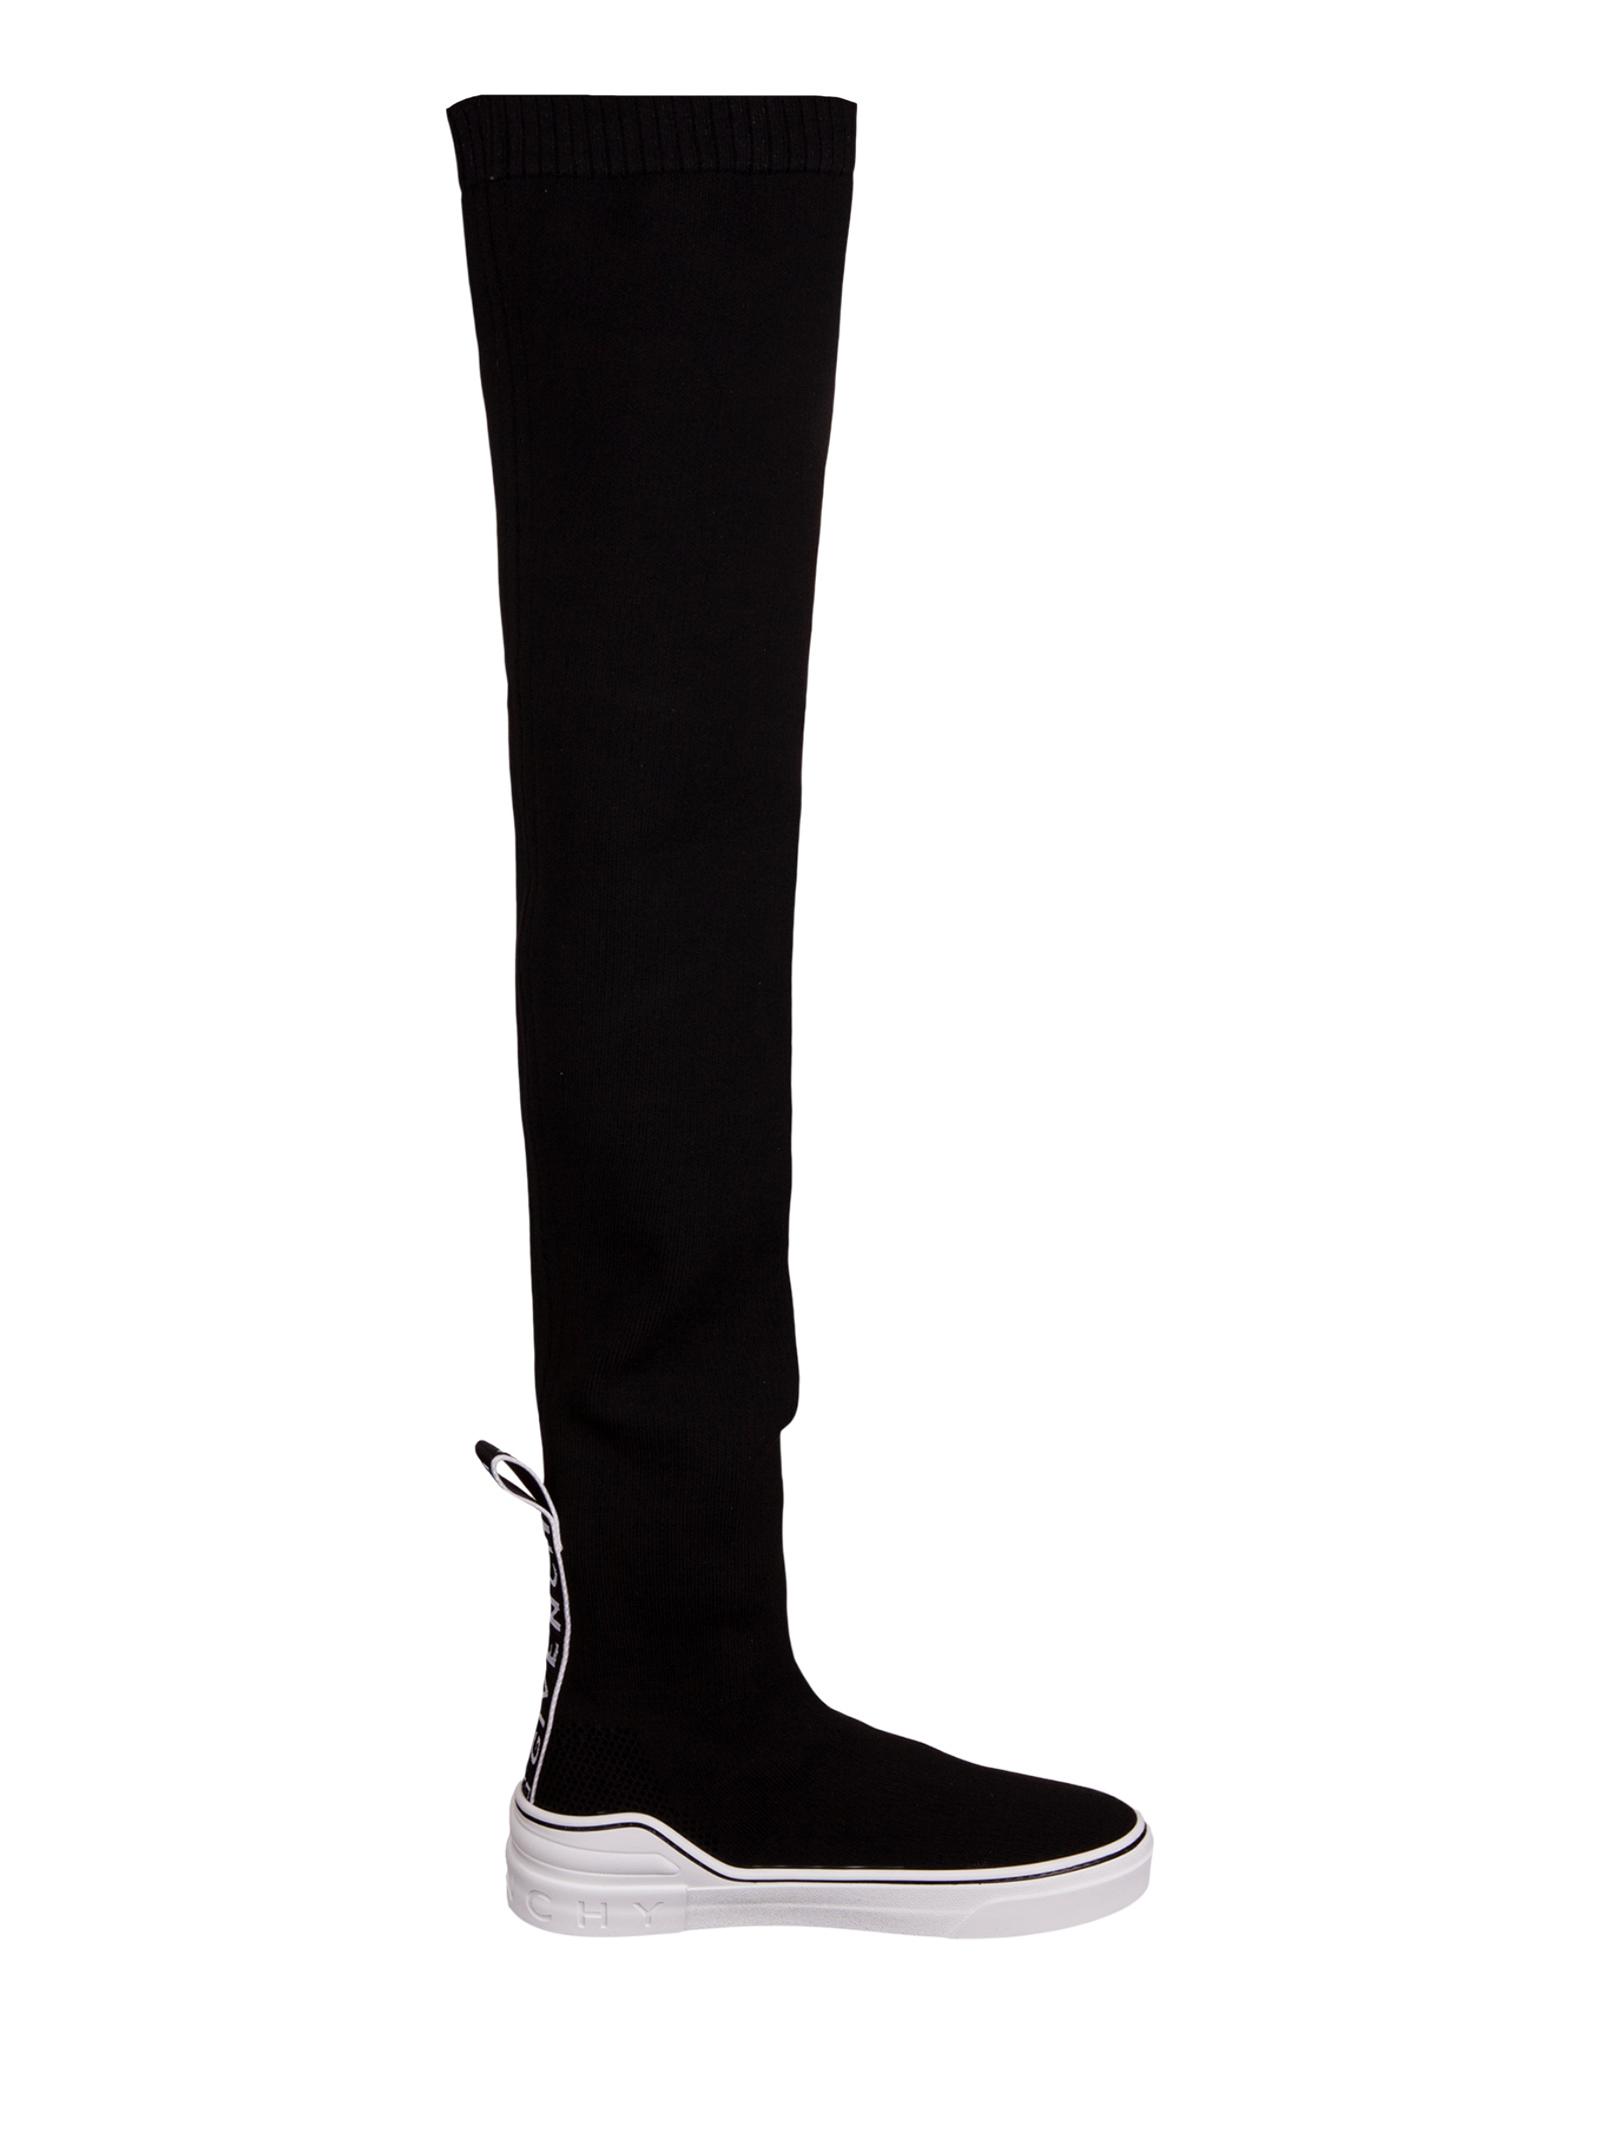 Givenchy Moda Givenchy Franzese Stivali Stivali Michele Stivali Givenchy Michele Michele Moda Franzese qO7fwW5EW